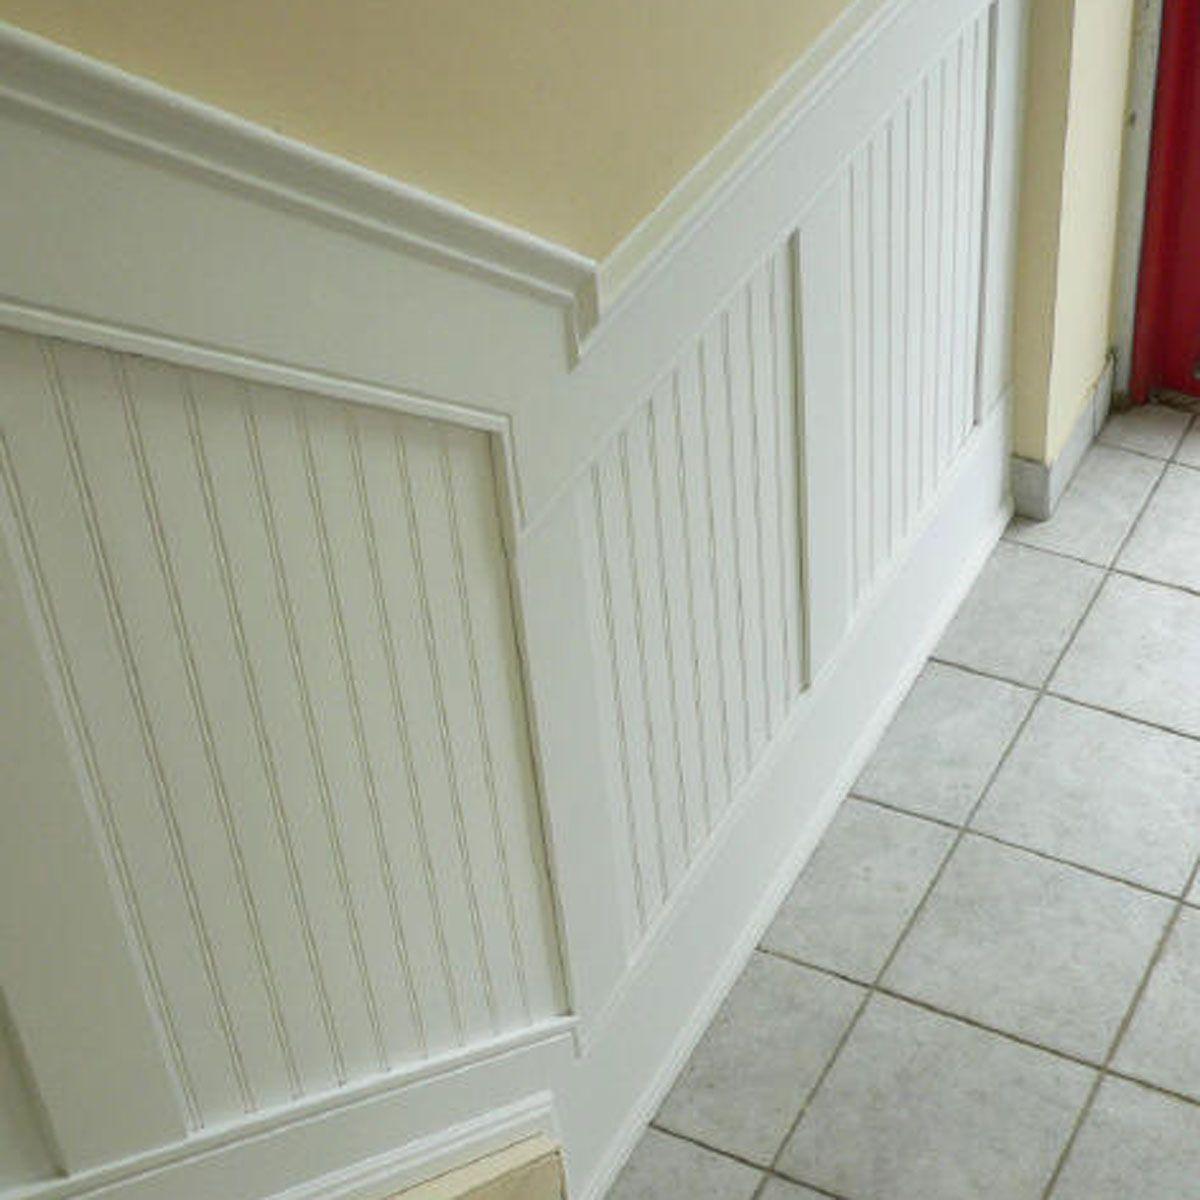 Di diy wainscoting dining room - 96 L Adjustable Height Beadboard Panel Stair Wainscoting Kit